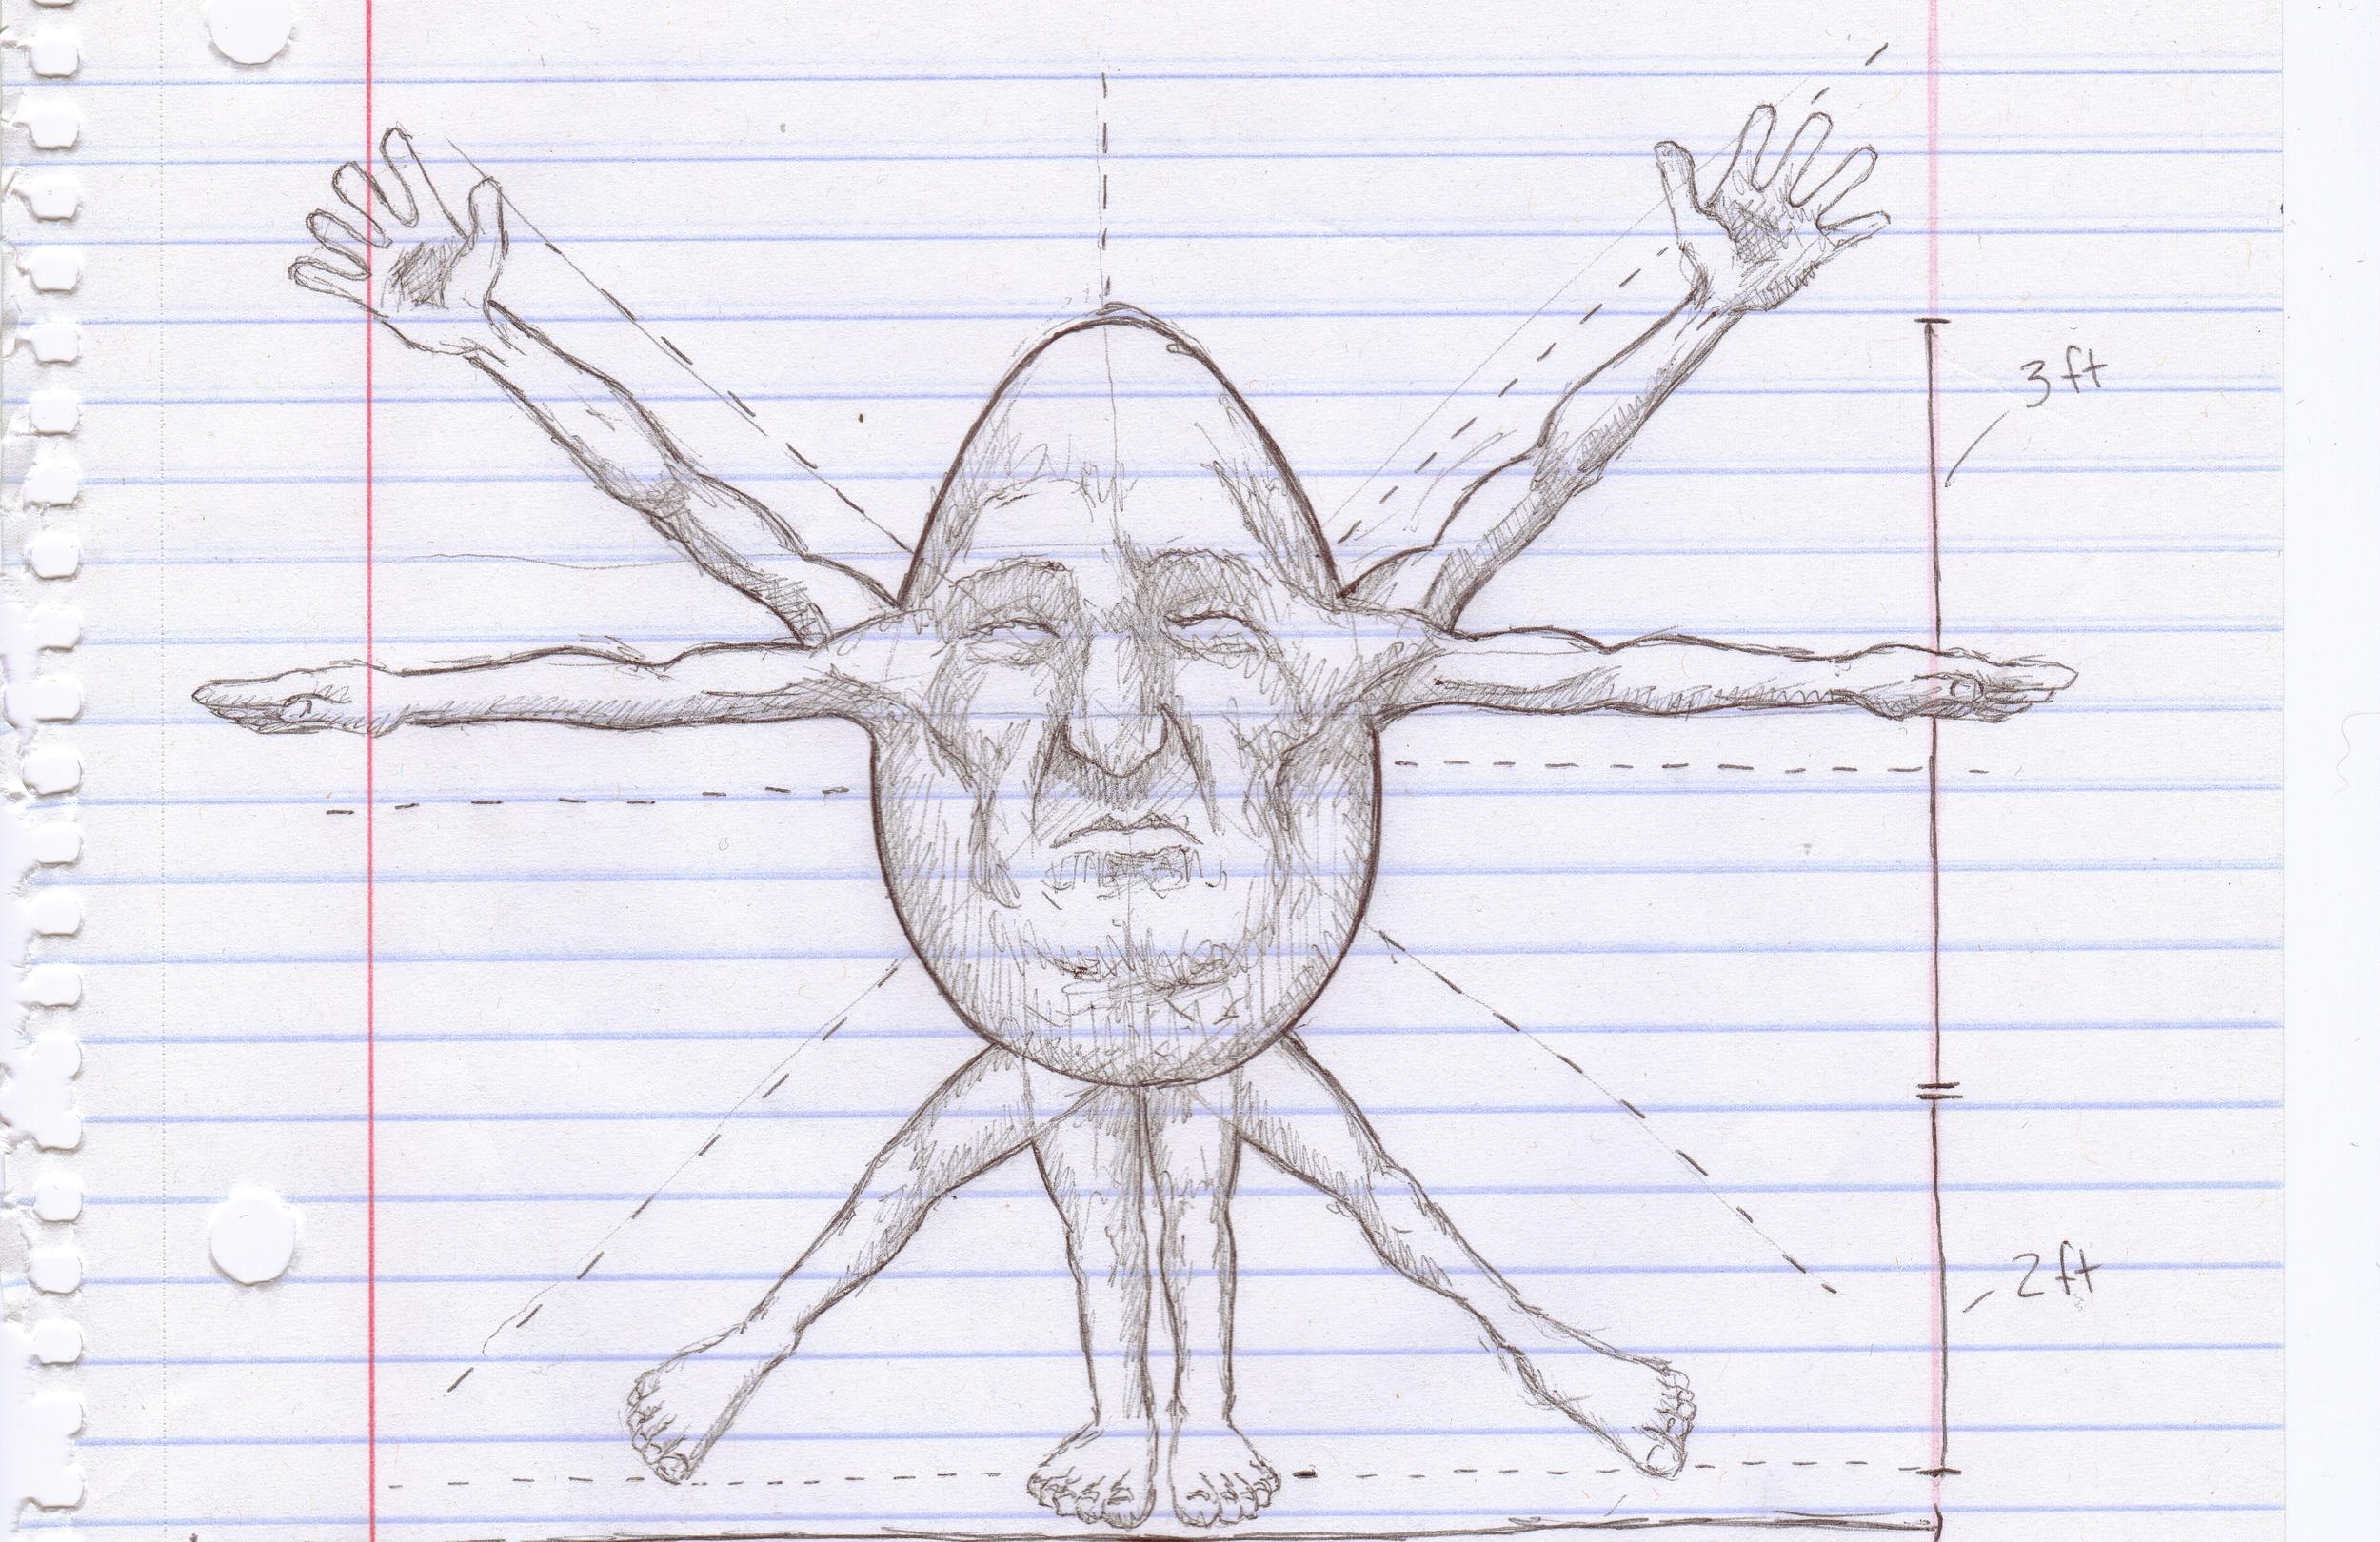 Study of Ovo Sapien   2010  Ballpoint Pen on Paper  5.5x8.5